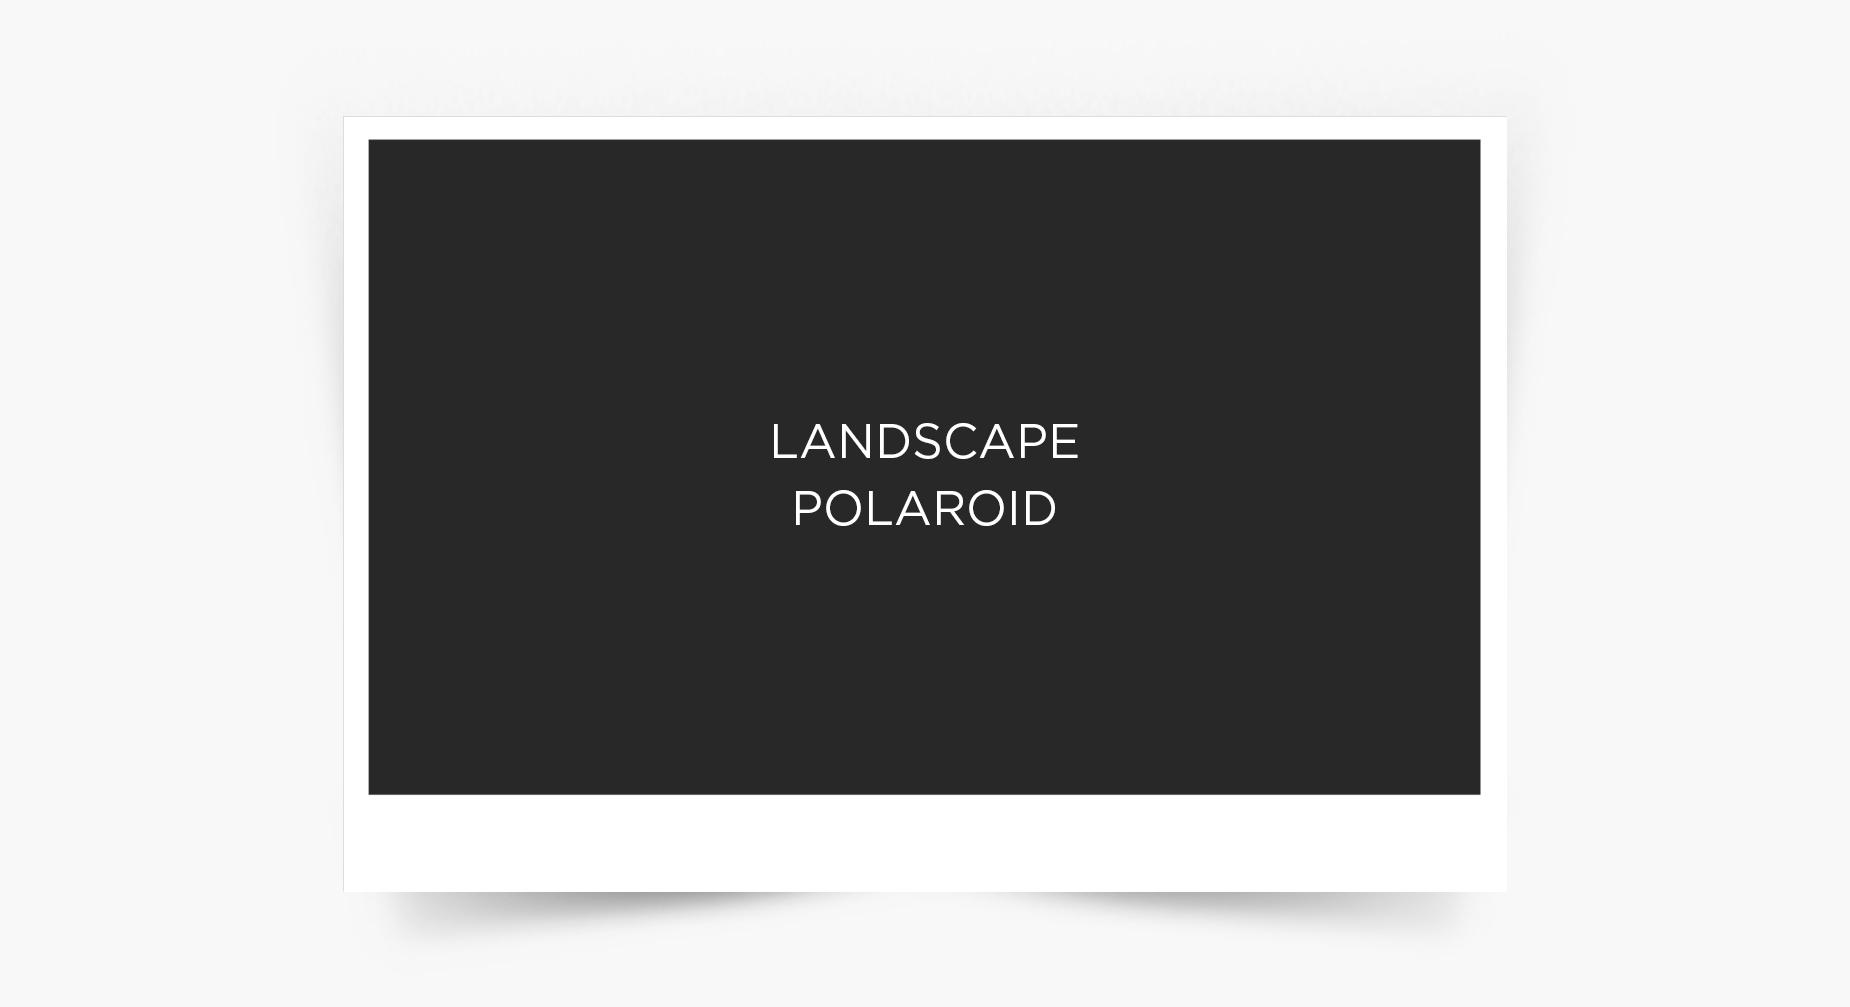 Landscape Polaroid